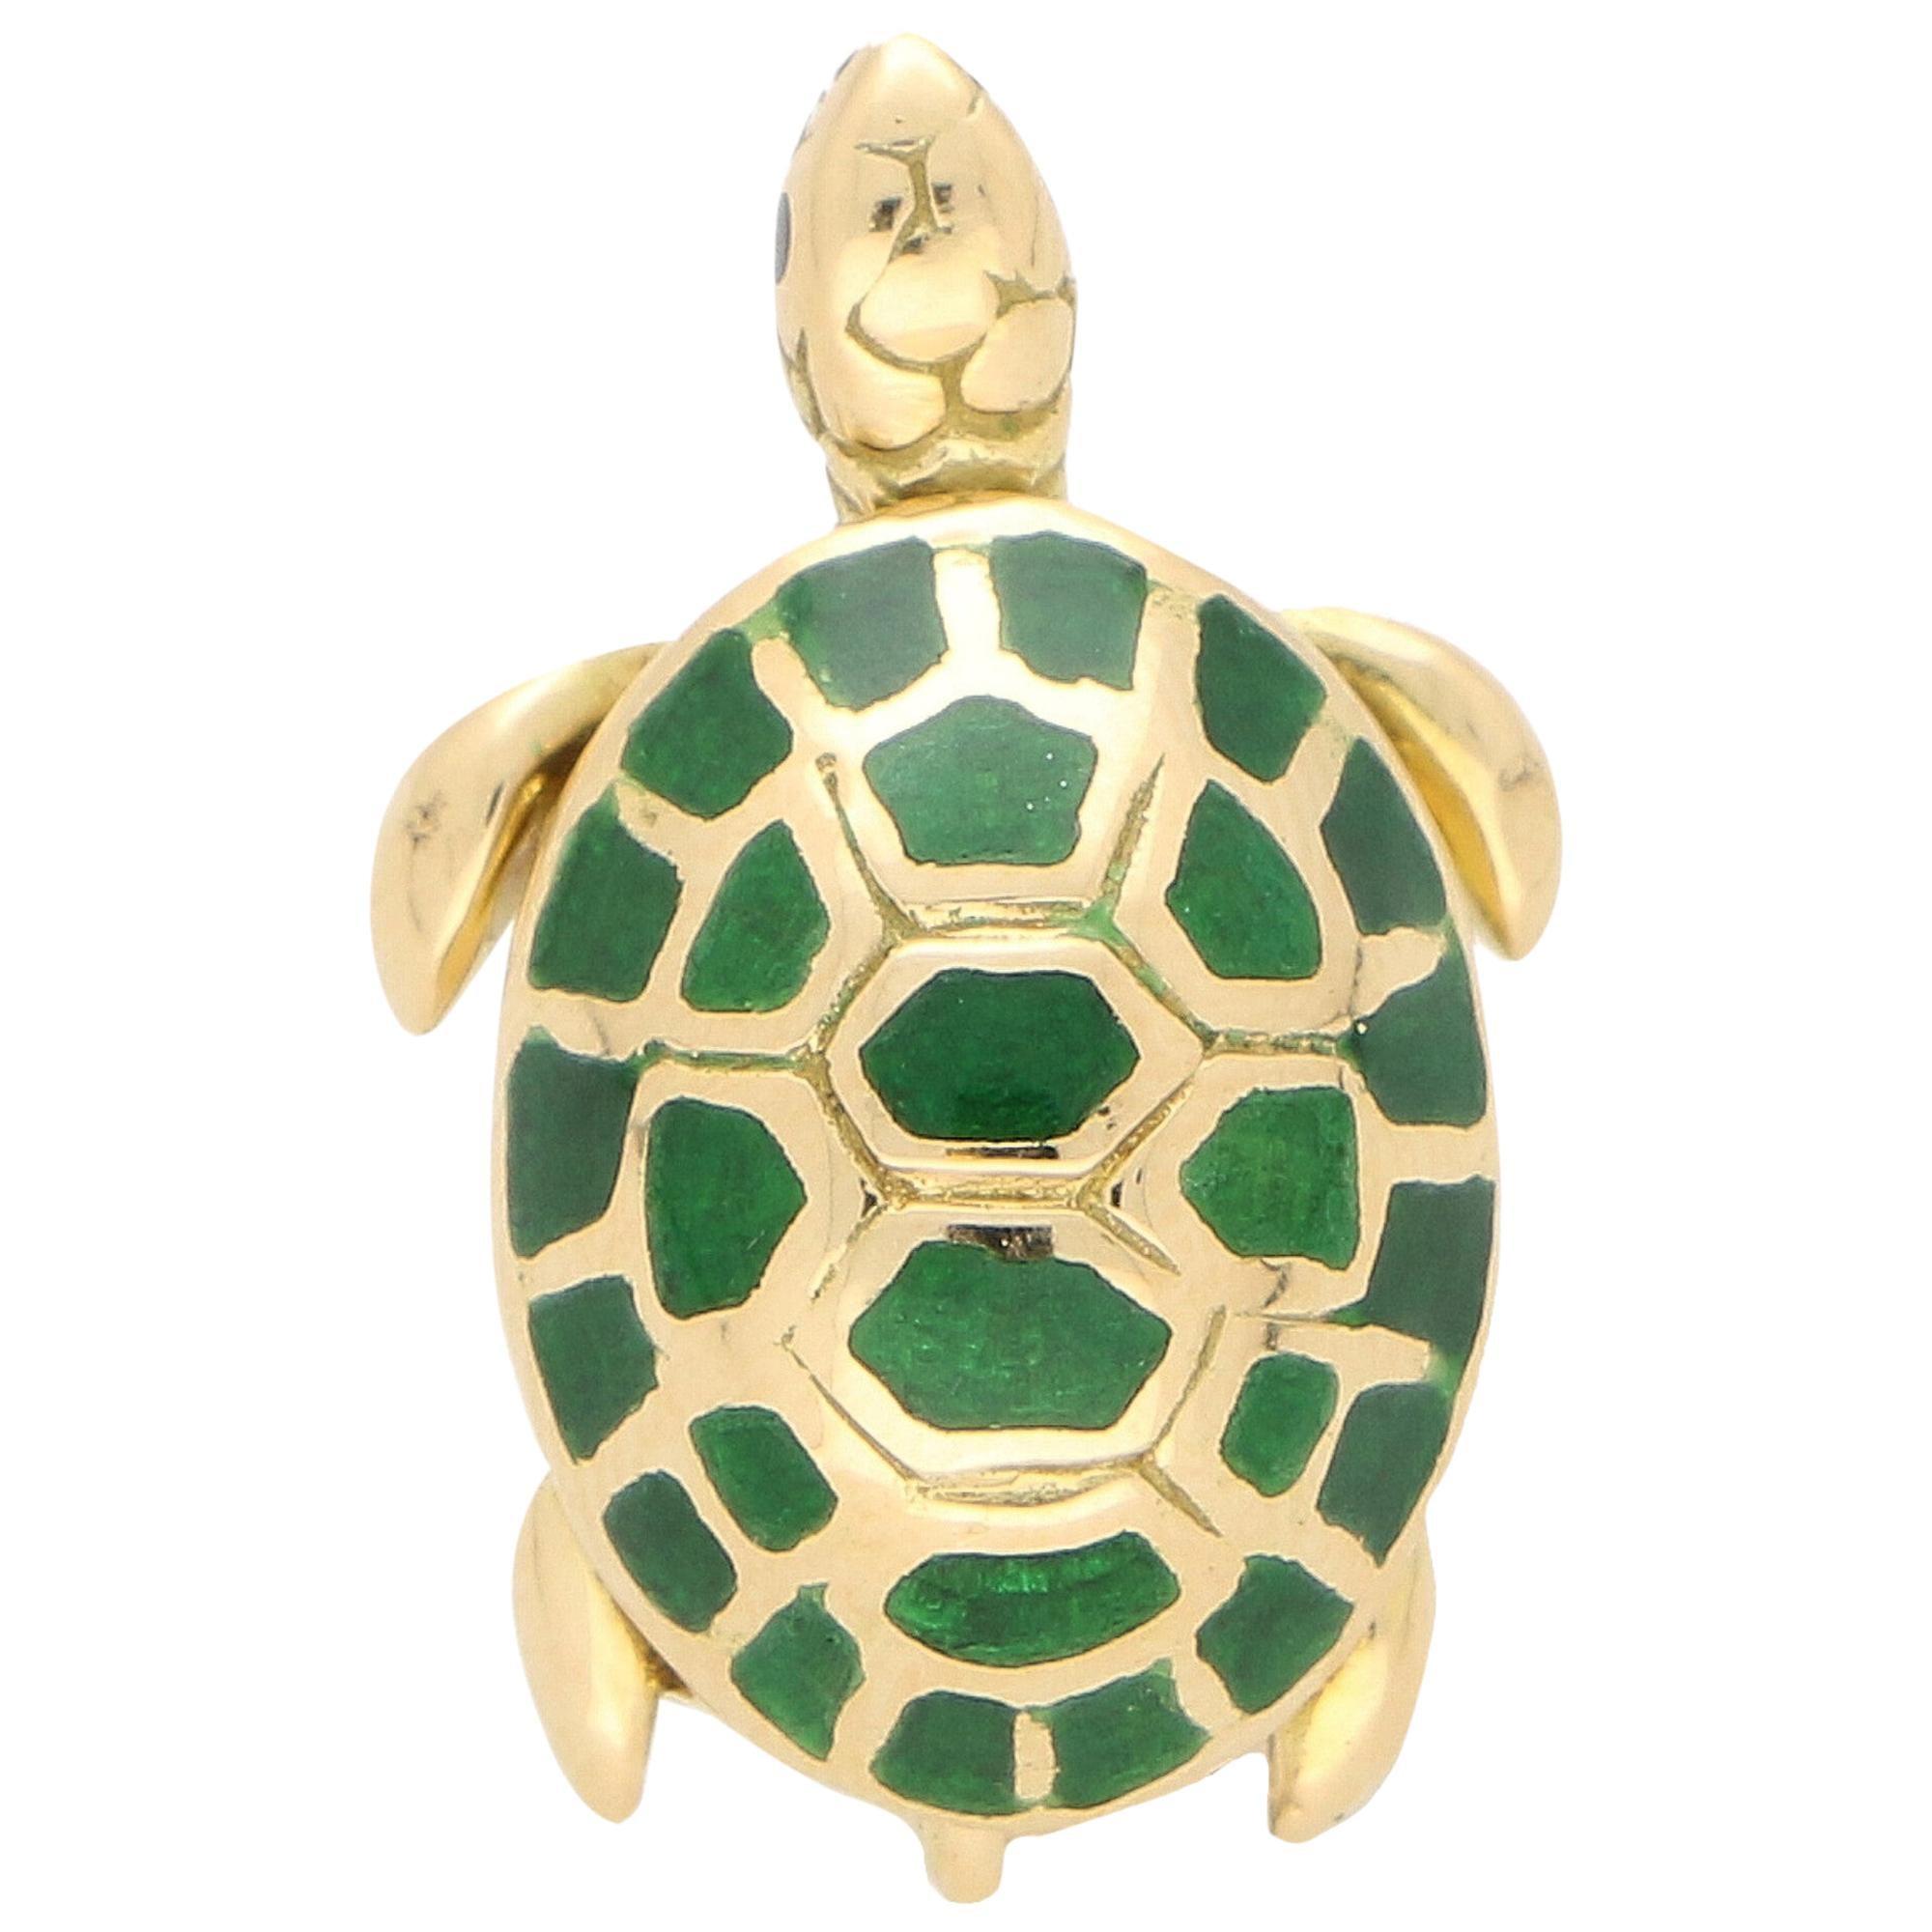 Boucheron Green Enamel Turtle Pin / Brooch Set in 18 Karat Yellow Gold